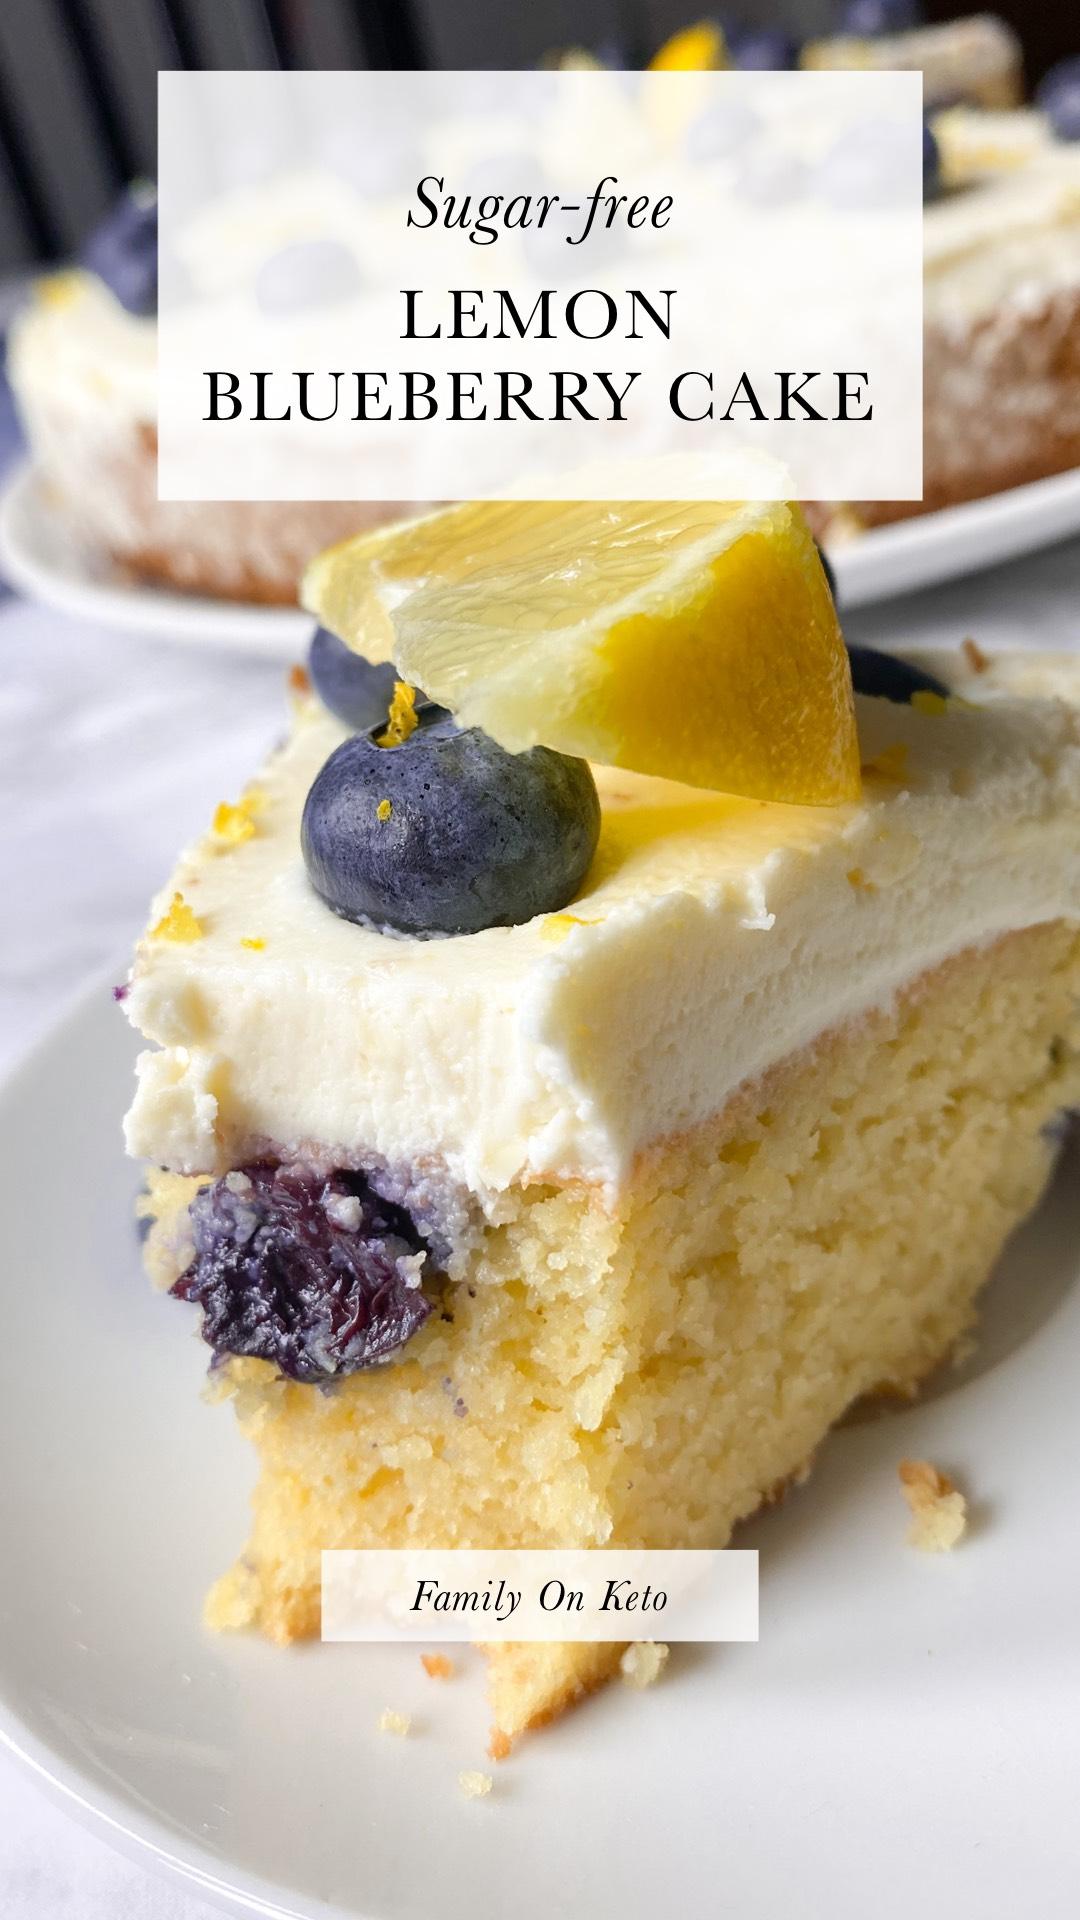 Picture of sugar-free lemon blueberry cake